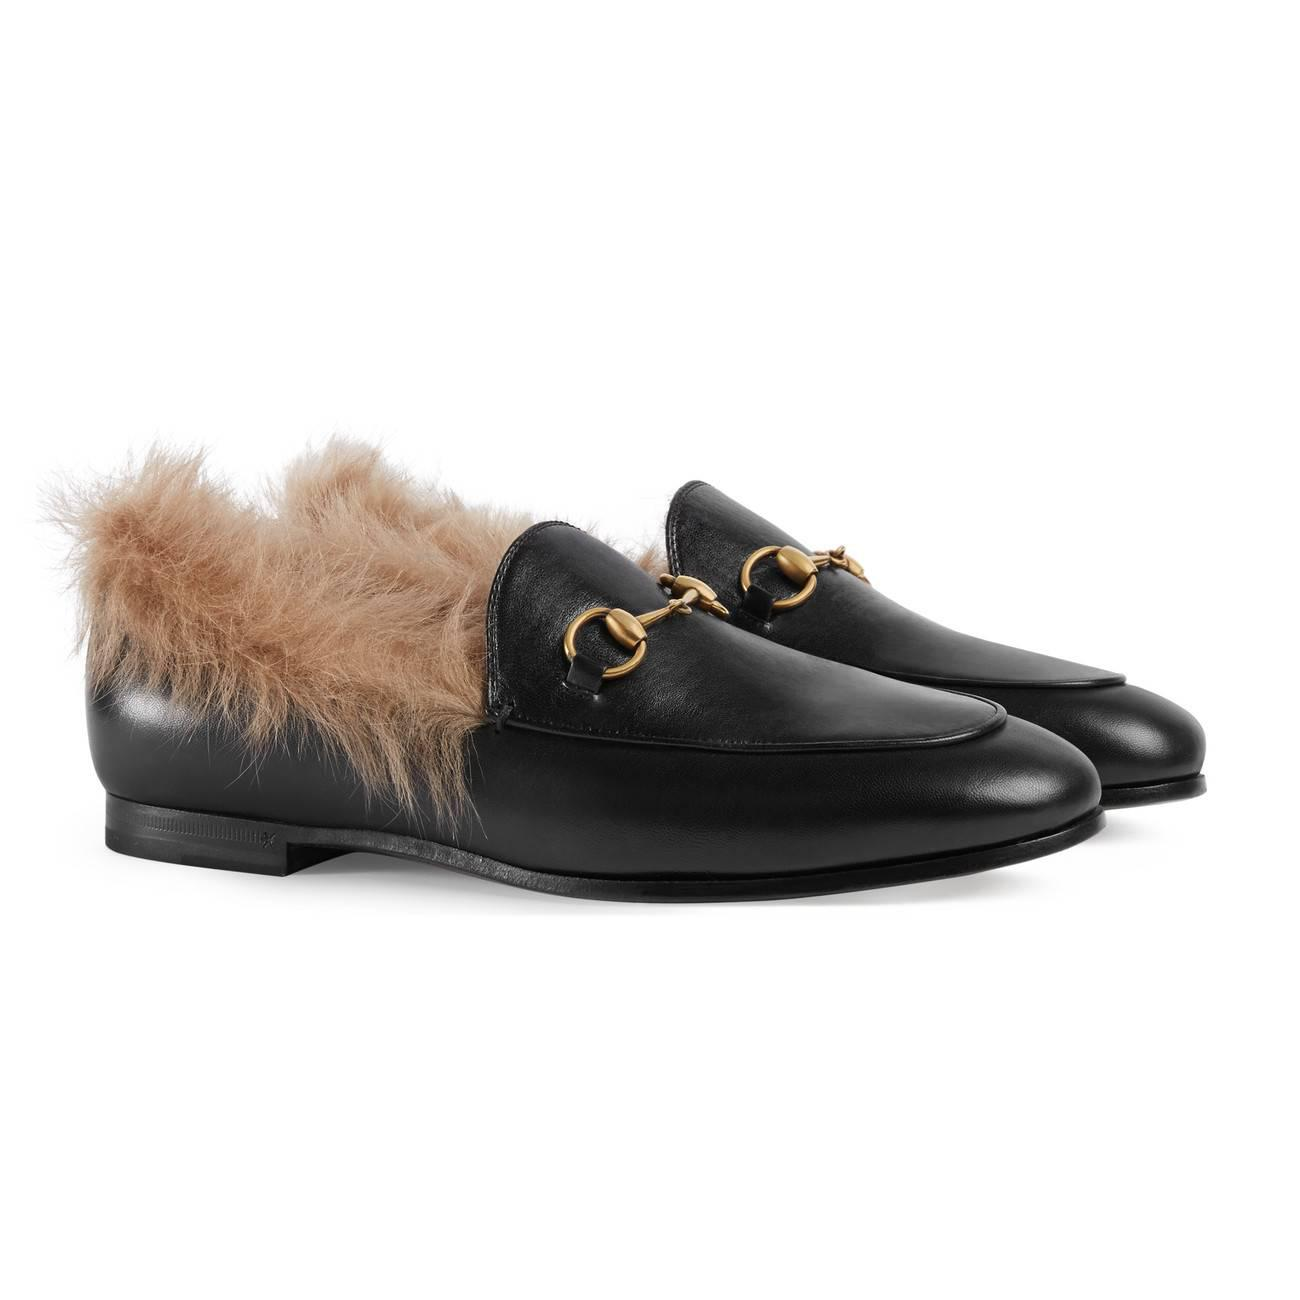 1cbd89d170d Gucci - Natural Jordaan Wool Loafer - Lyst. View fullscreen